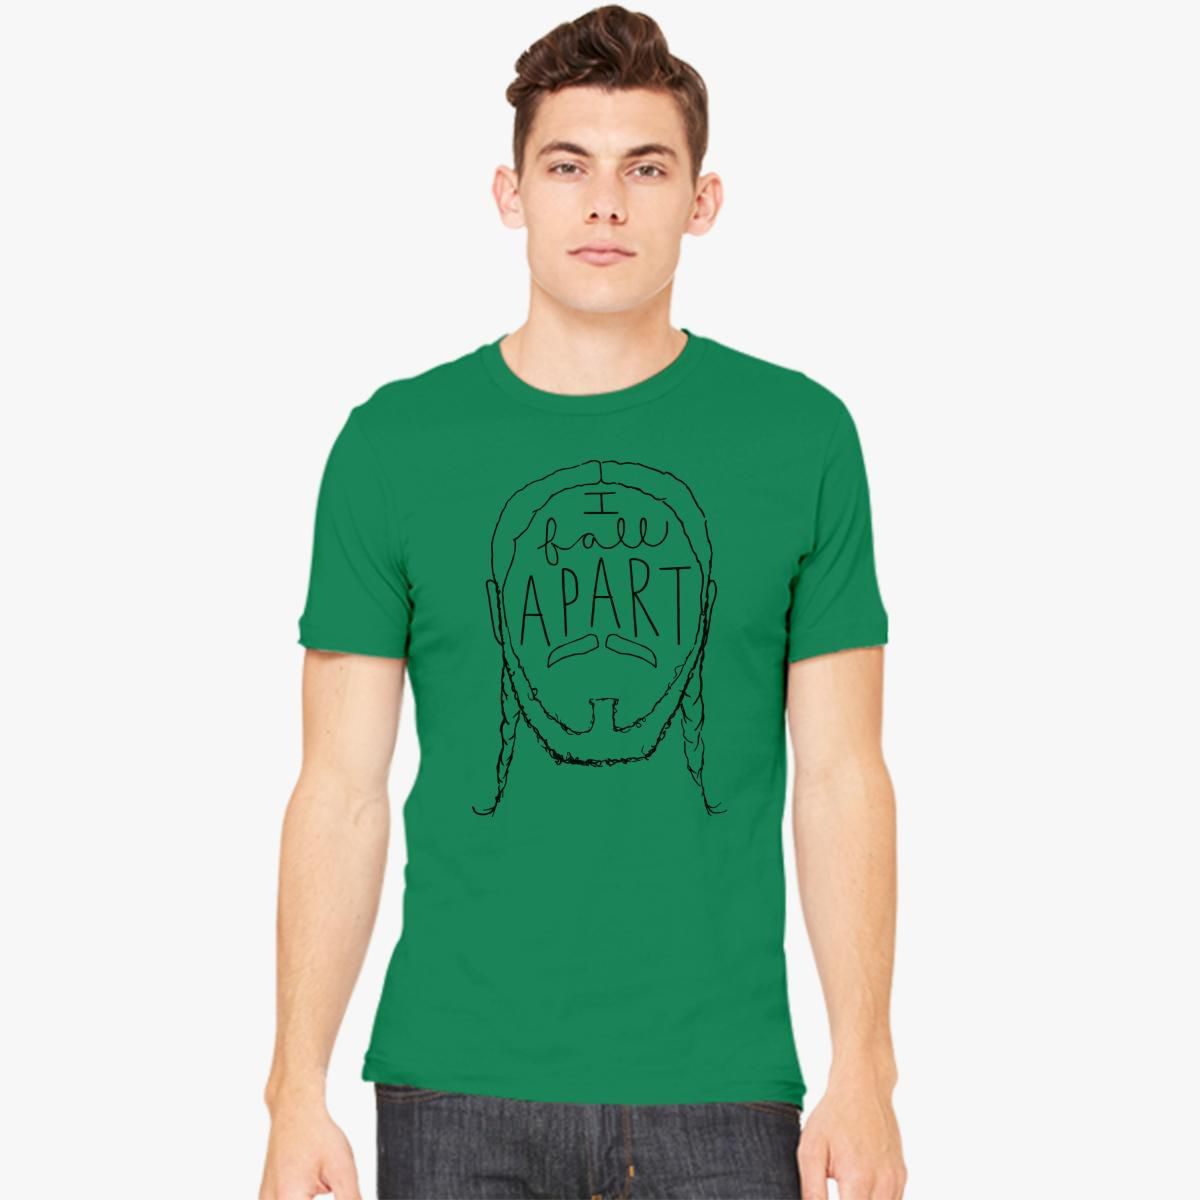 Post Malone I Fall Apart Guitar: Post Malone I Fall Apart Men's T-shirt